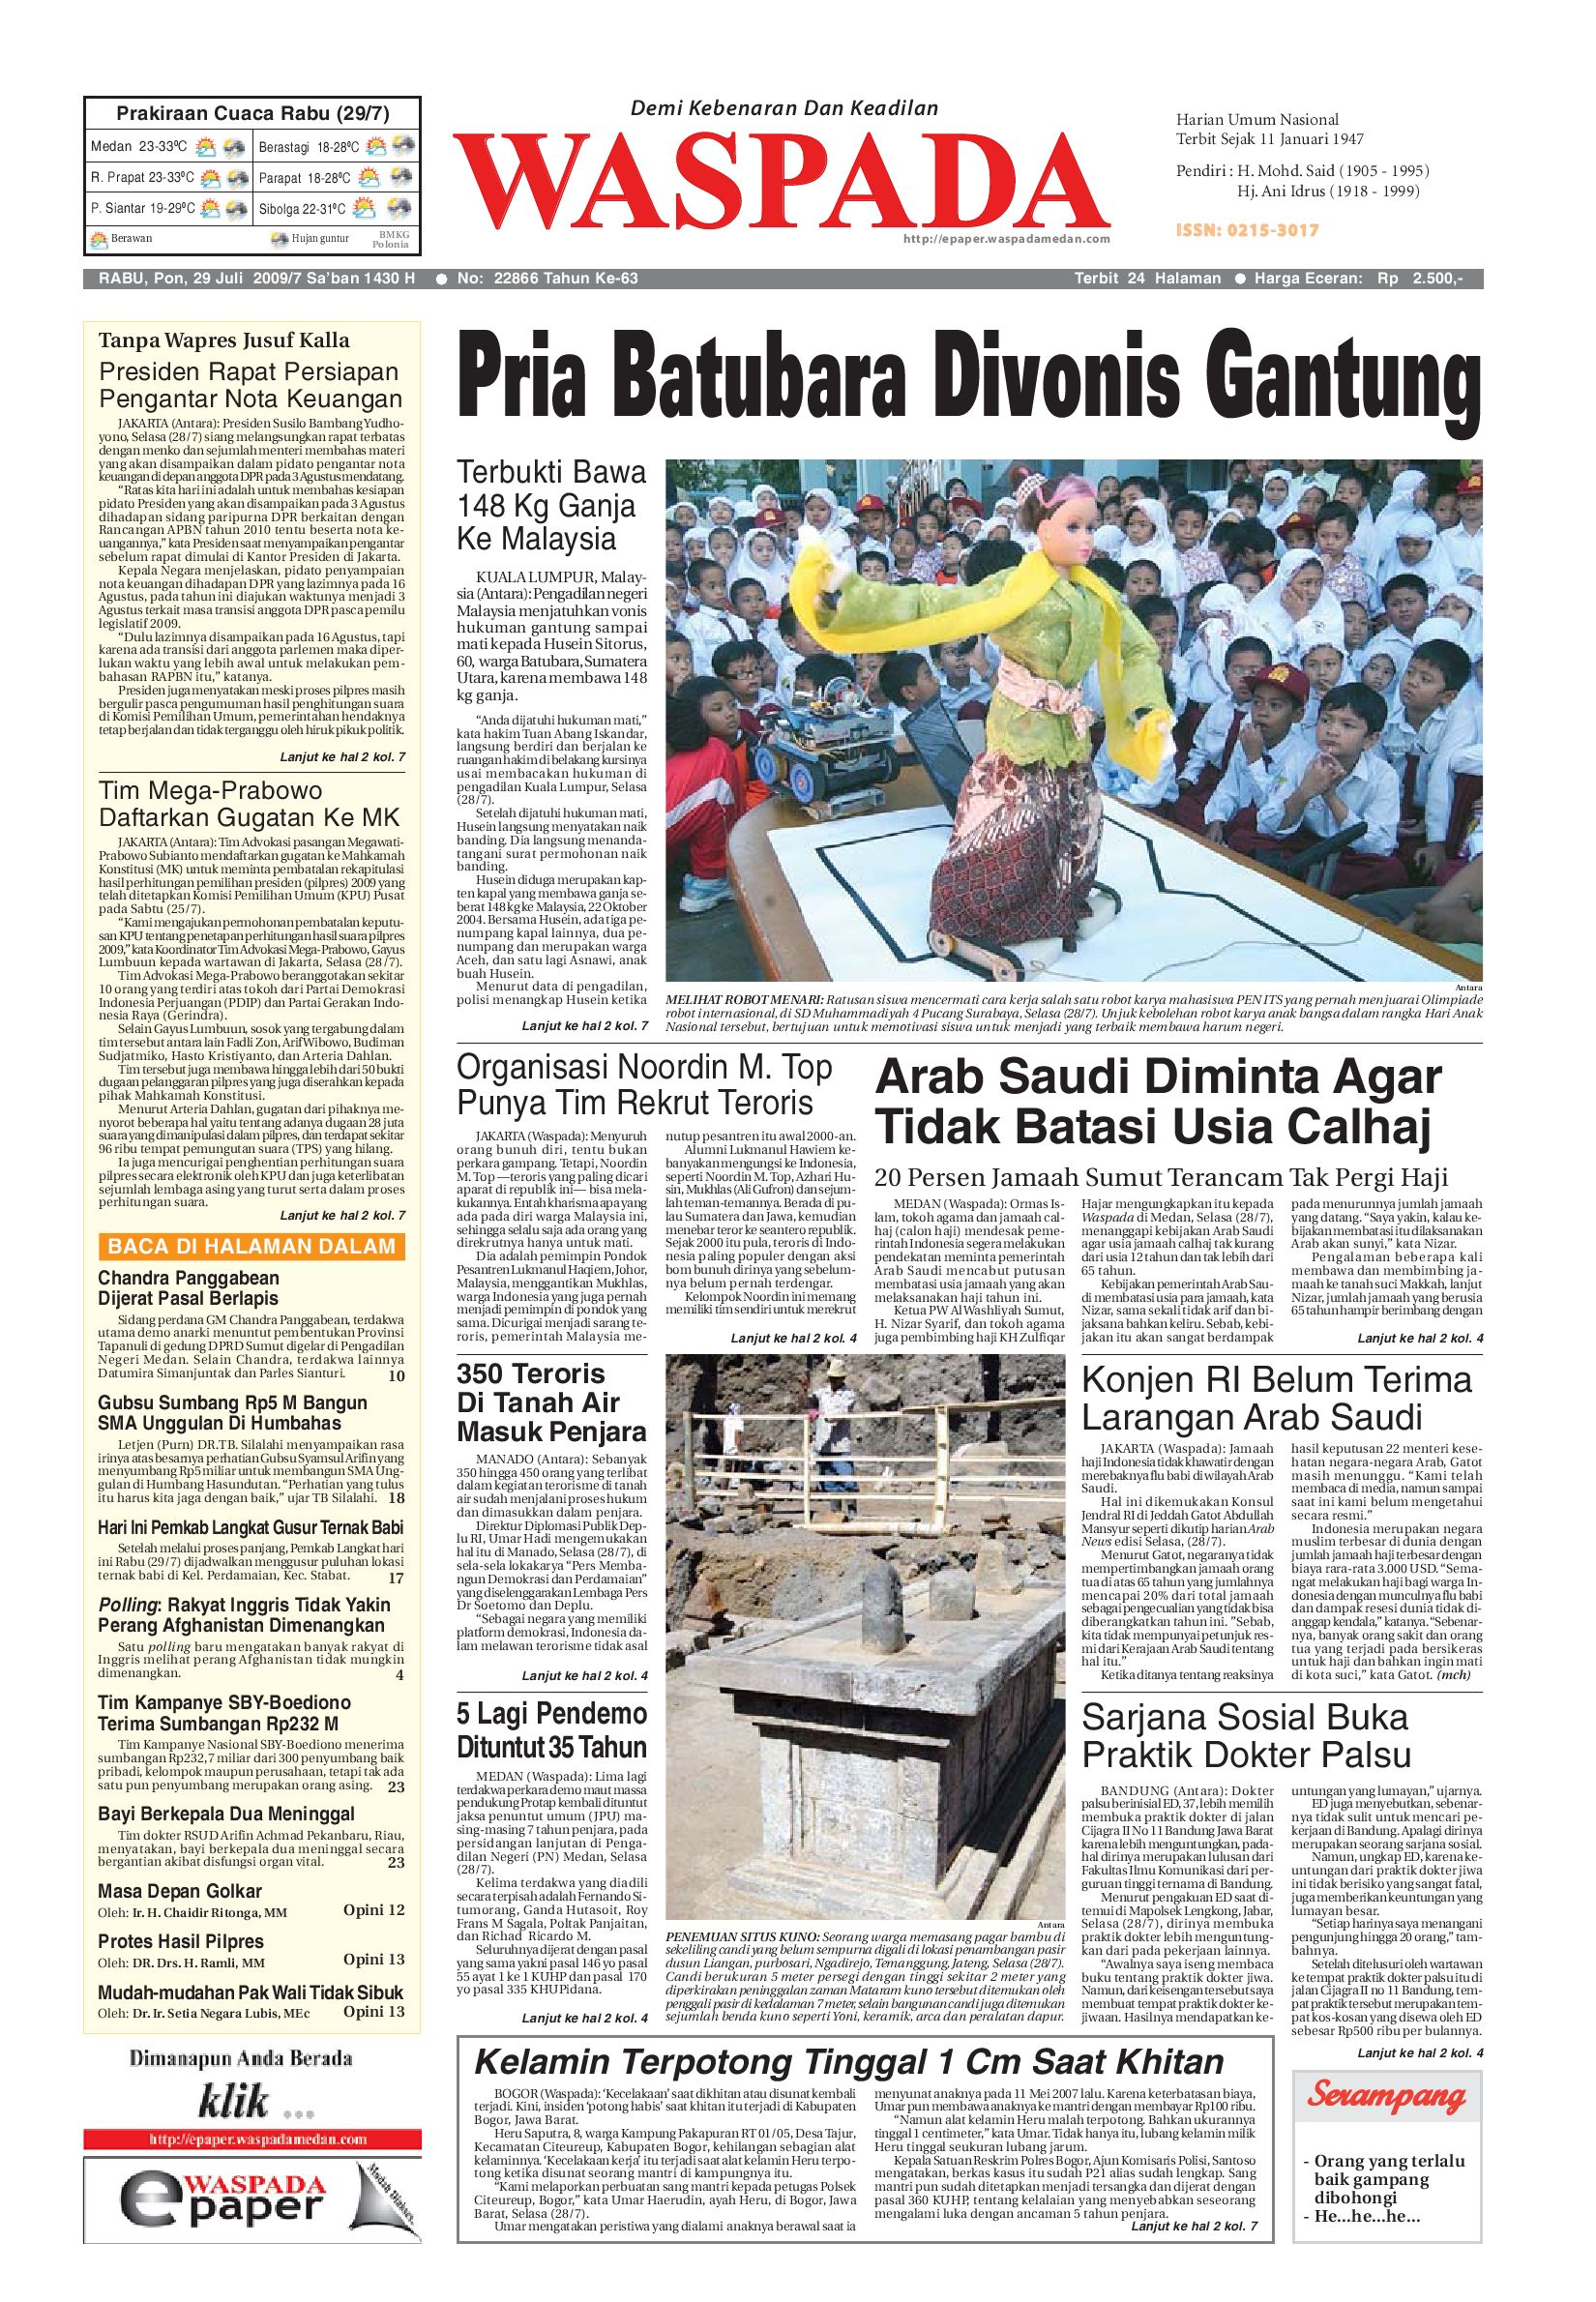 Waspada Rabu 29 Juli 2009 By Harian Issuu Tcash Vaganza 39 Bantal Mobil 3 In 1 Juventus Aksesoris